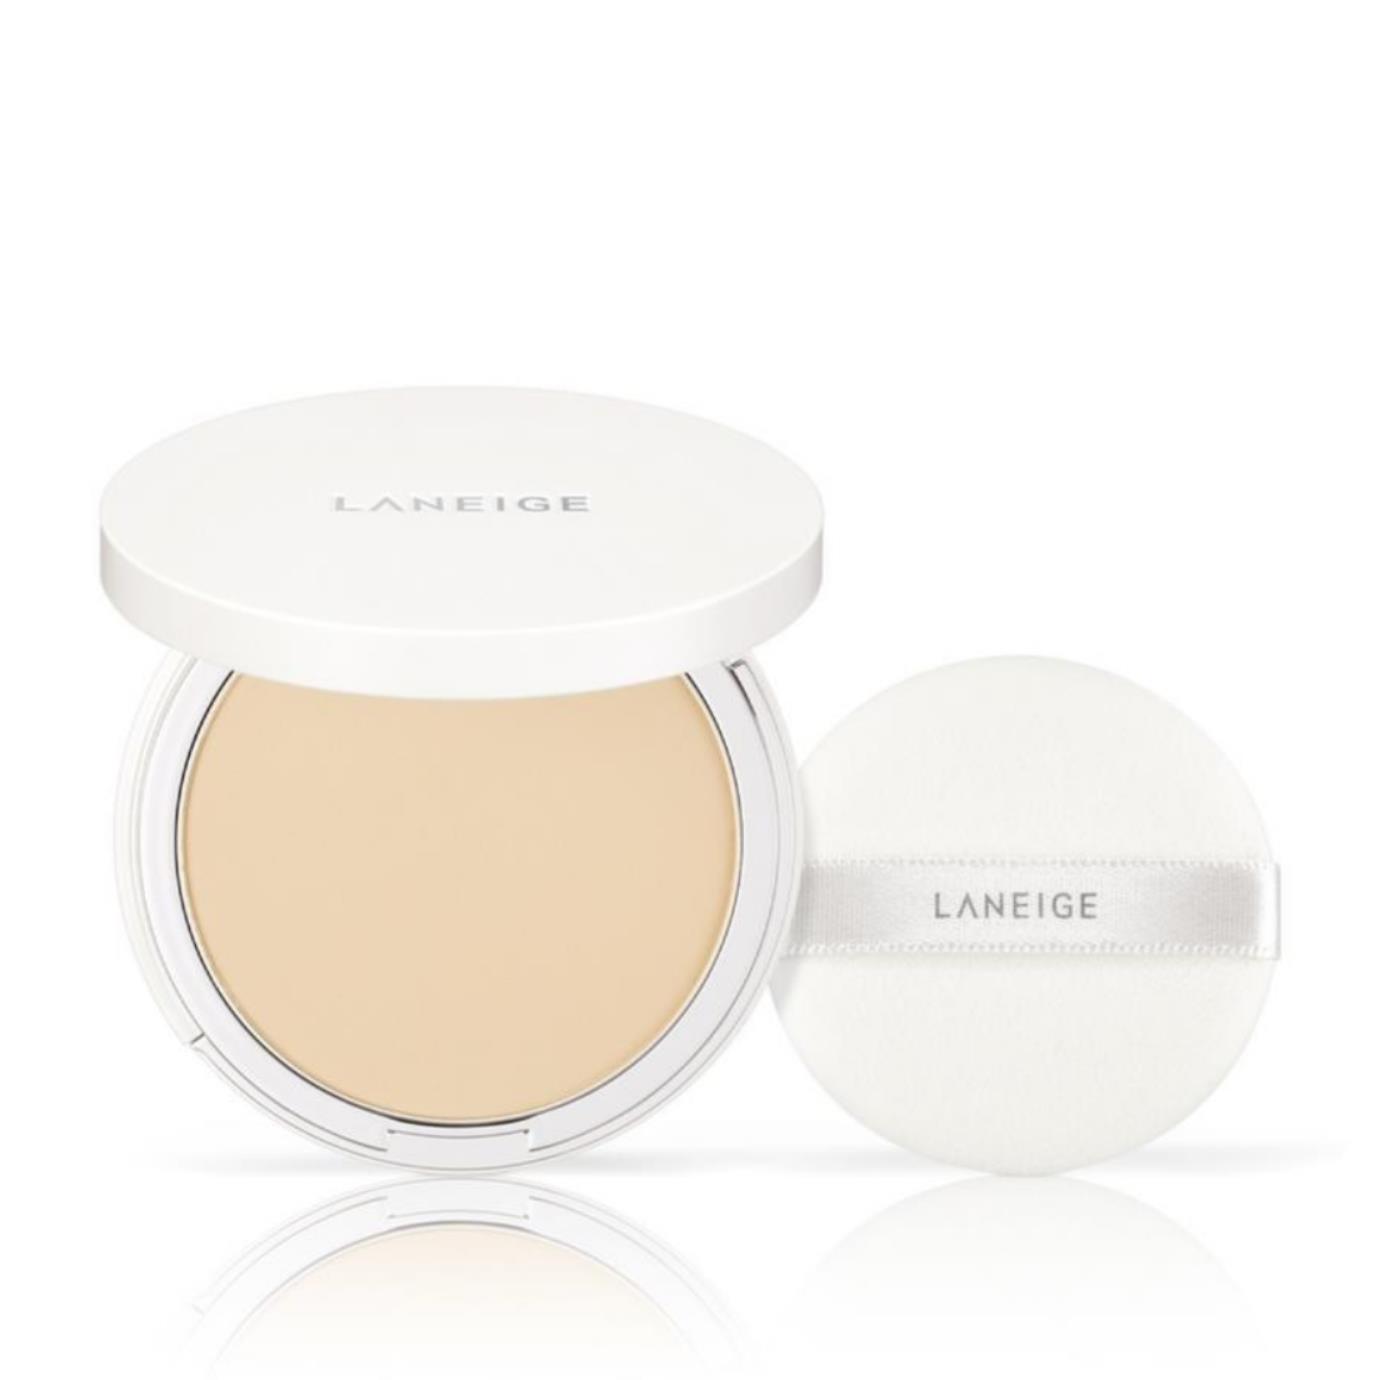 Laneige-Light-Fit-Powder